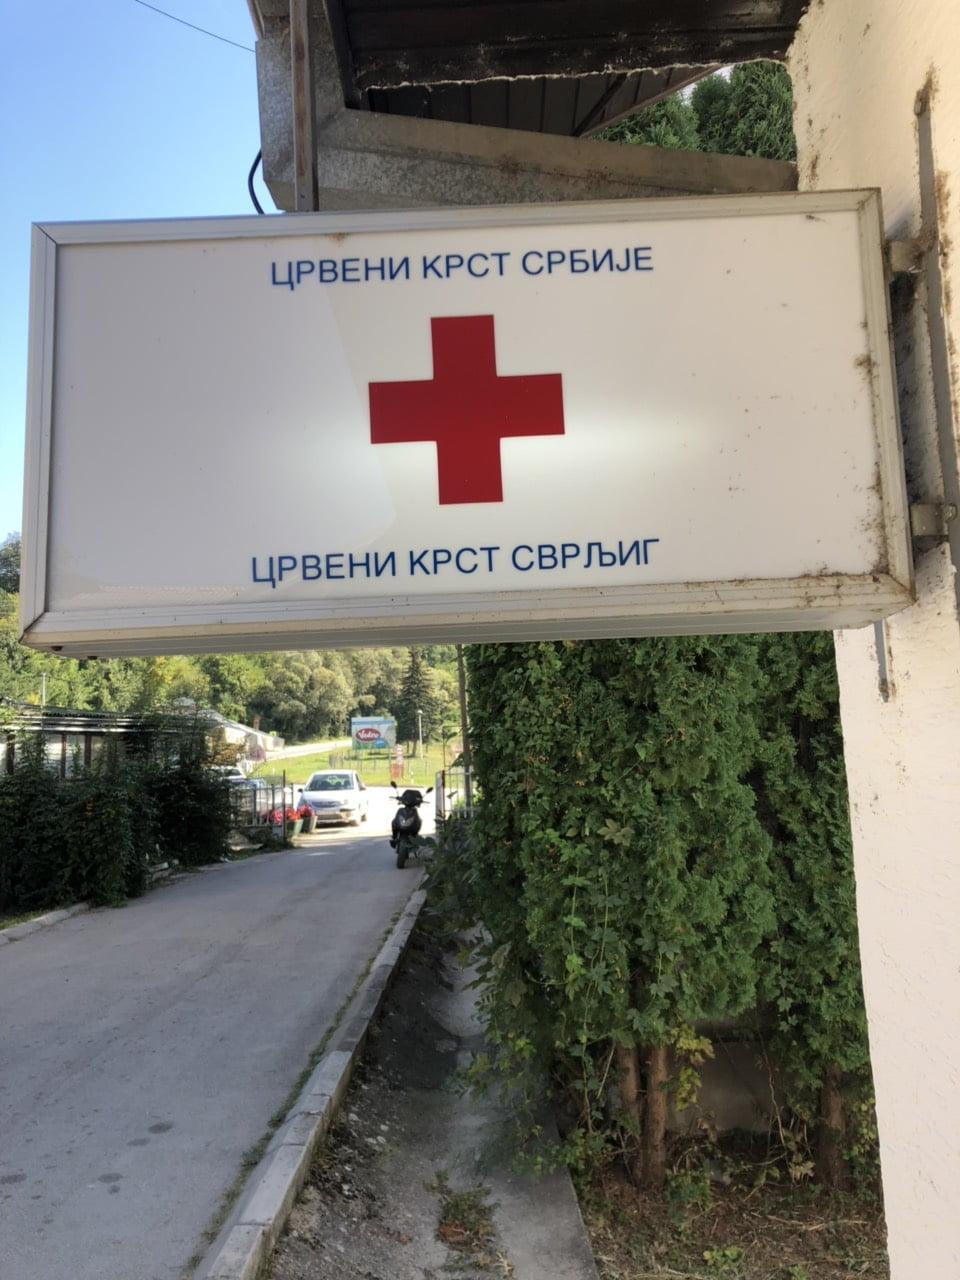 Crveni krst tabla, foto: M. Miladinović